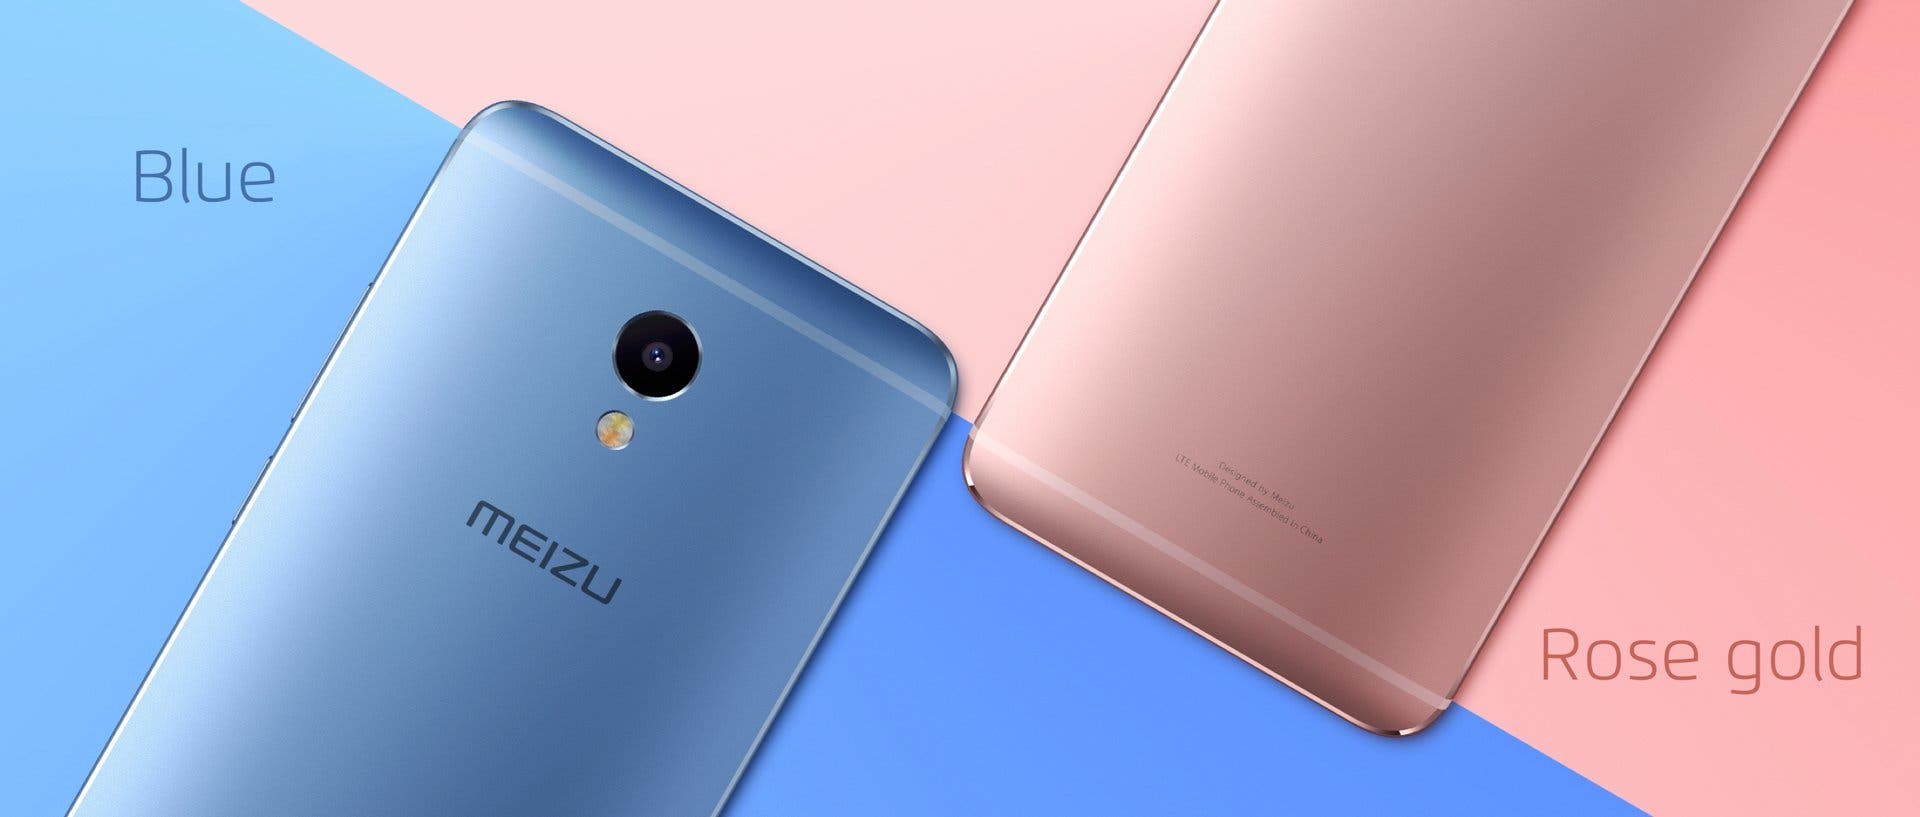 meizu m3e launched